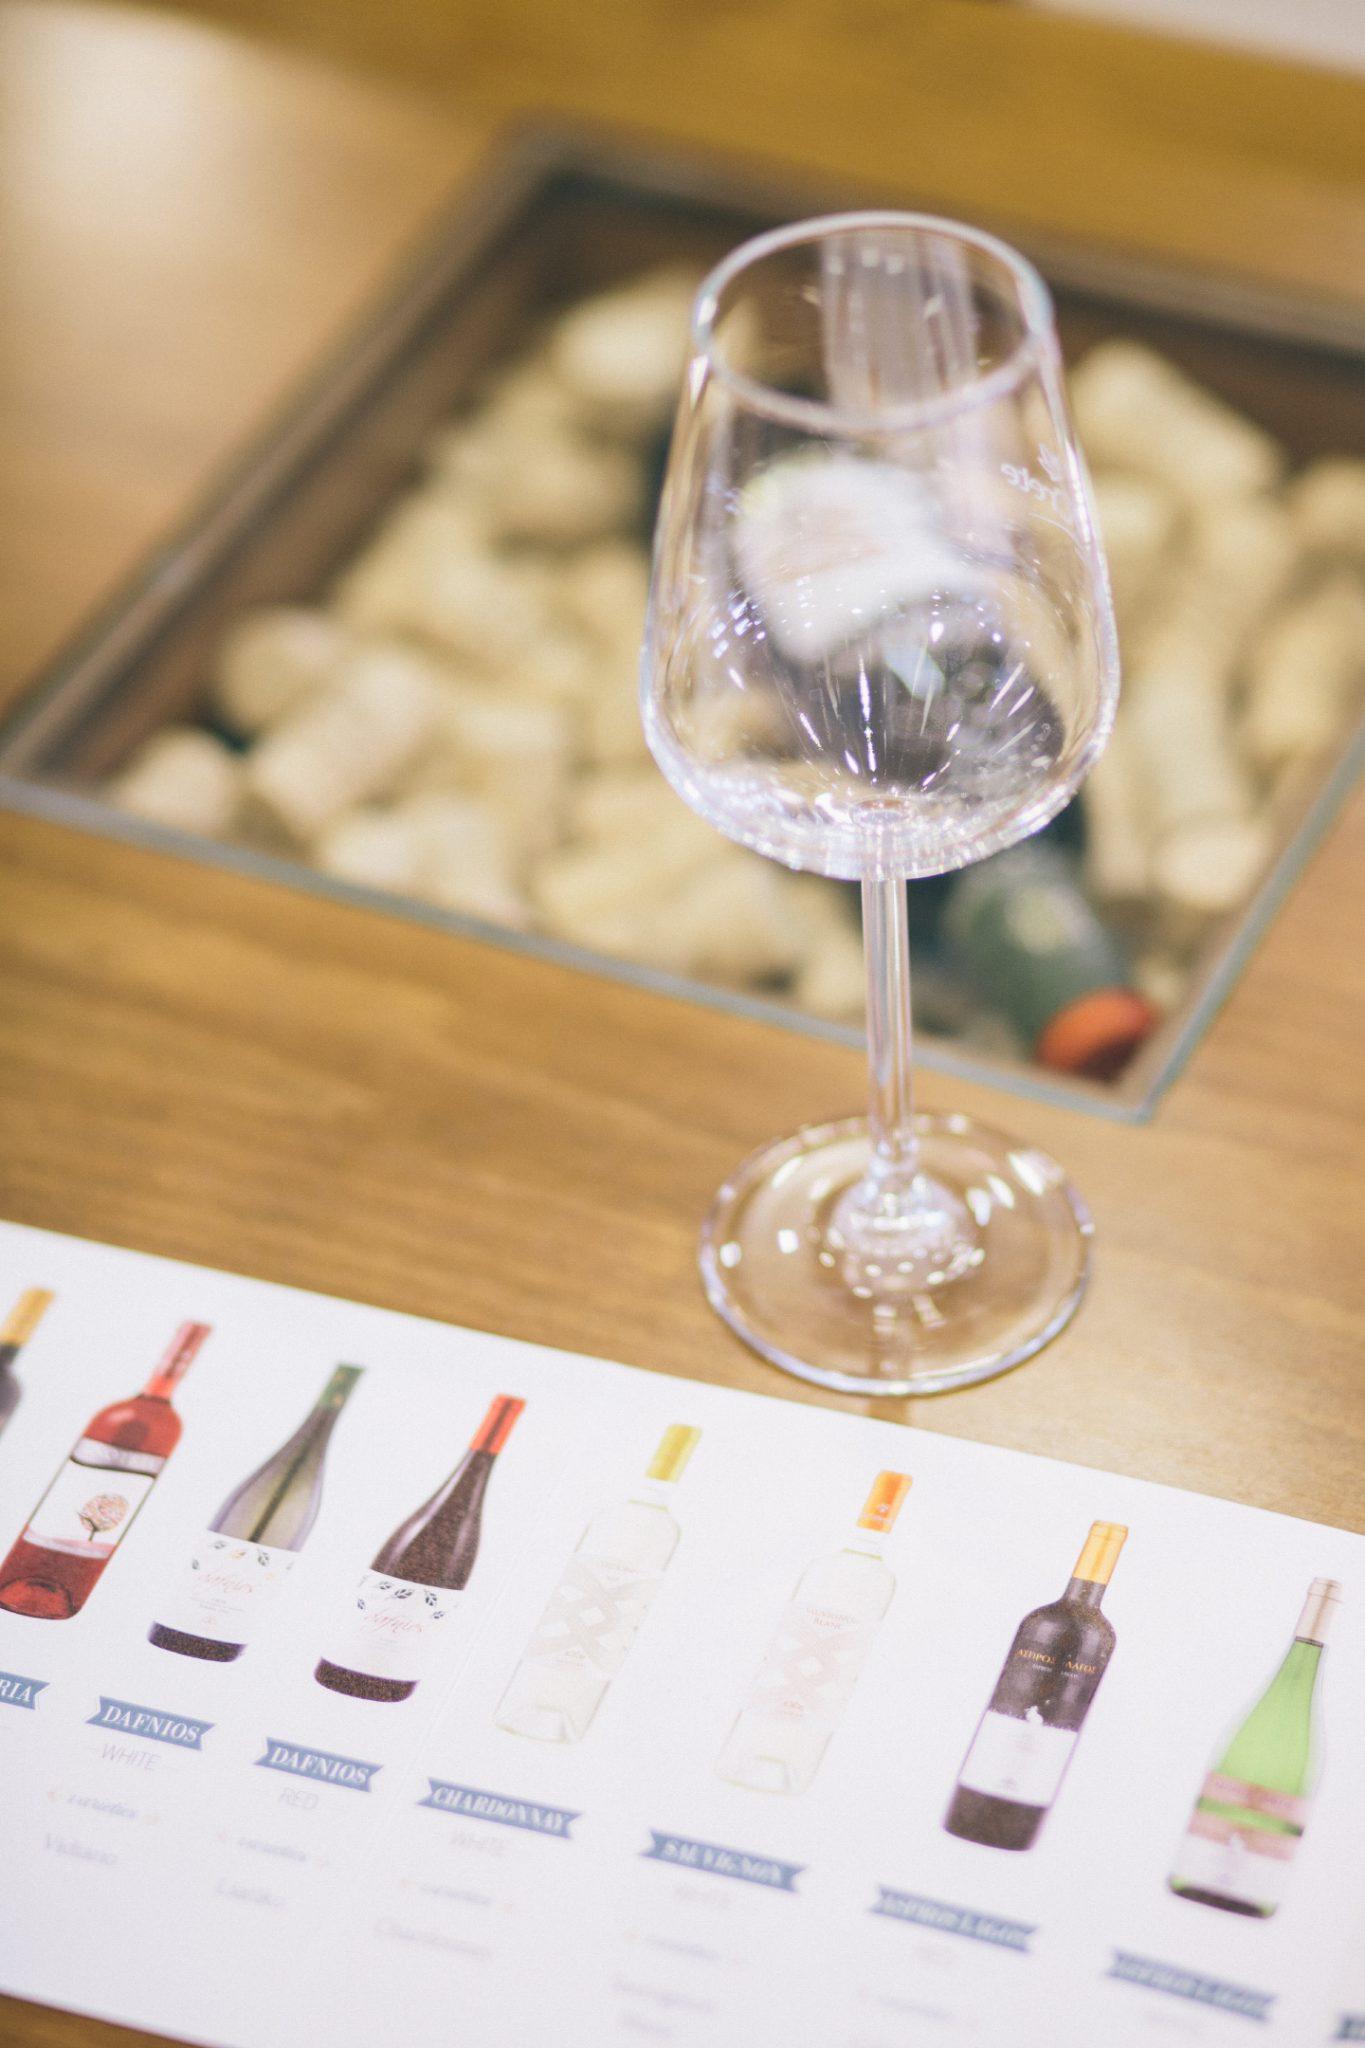 douloufakis-winery-crete